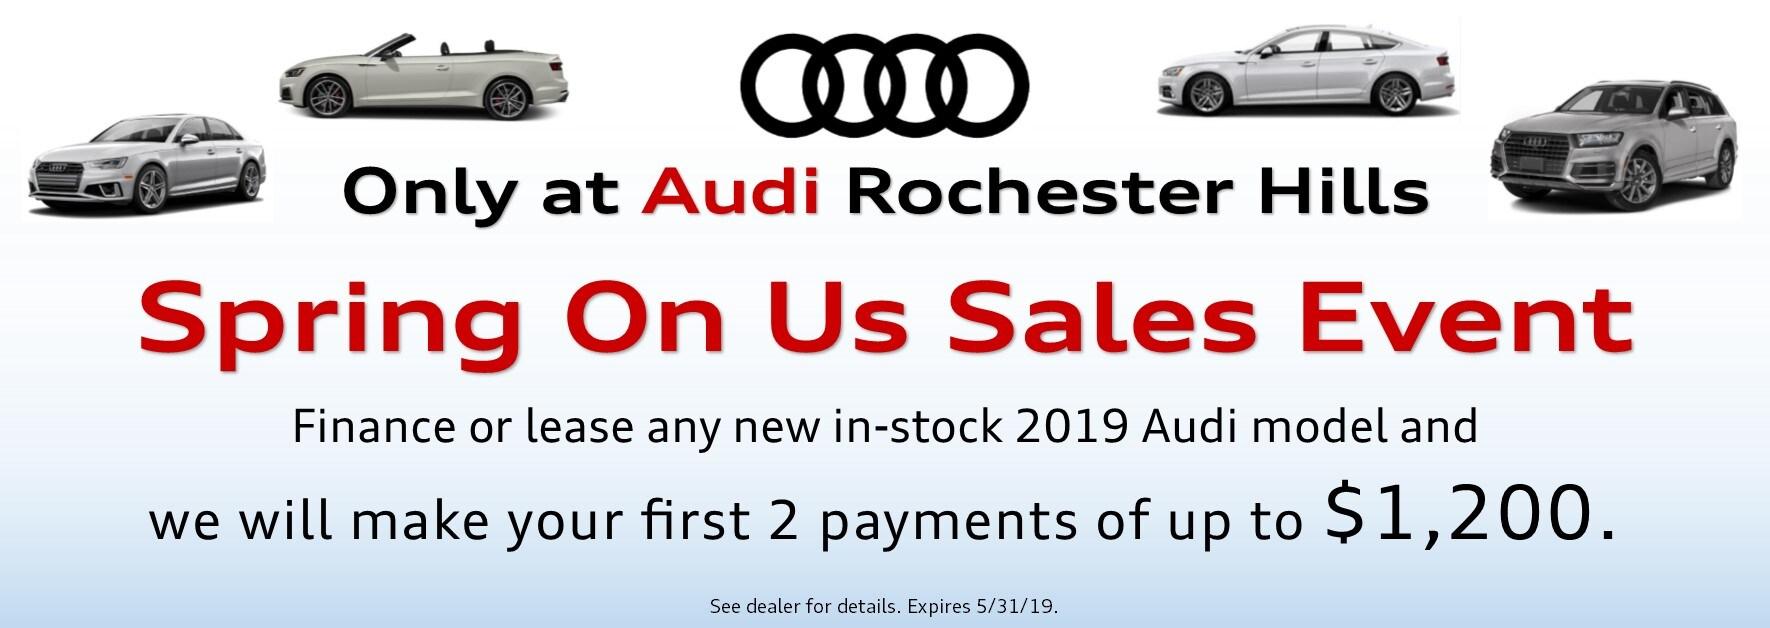 Audi Rochester Hills New Audi Dealership In Rochester Hills Mi